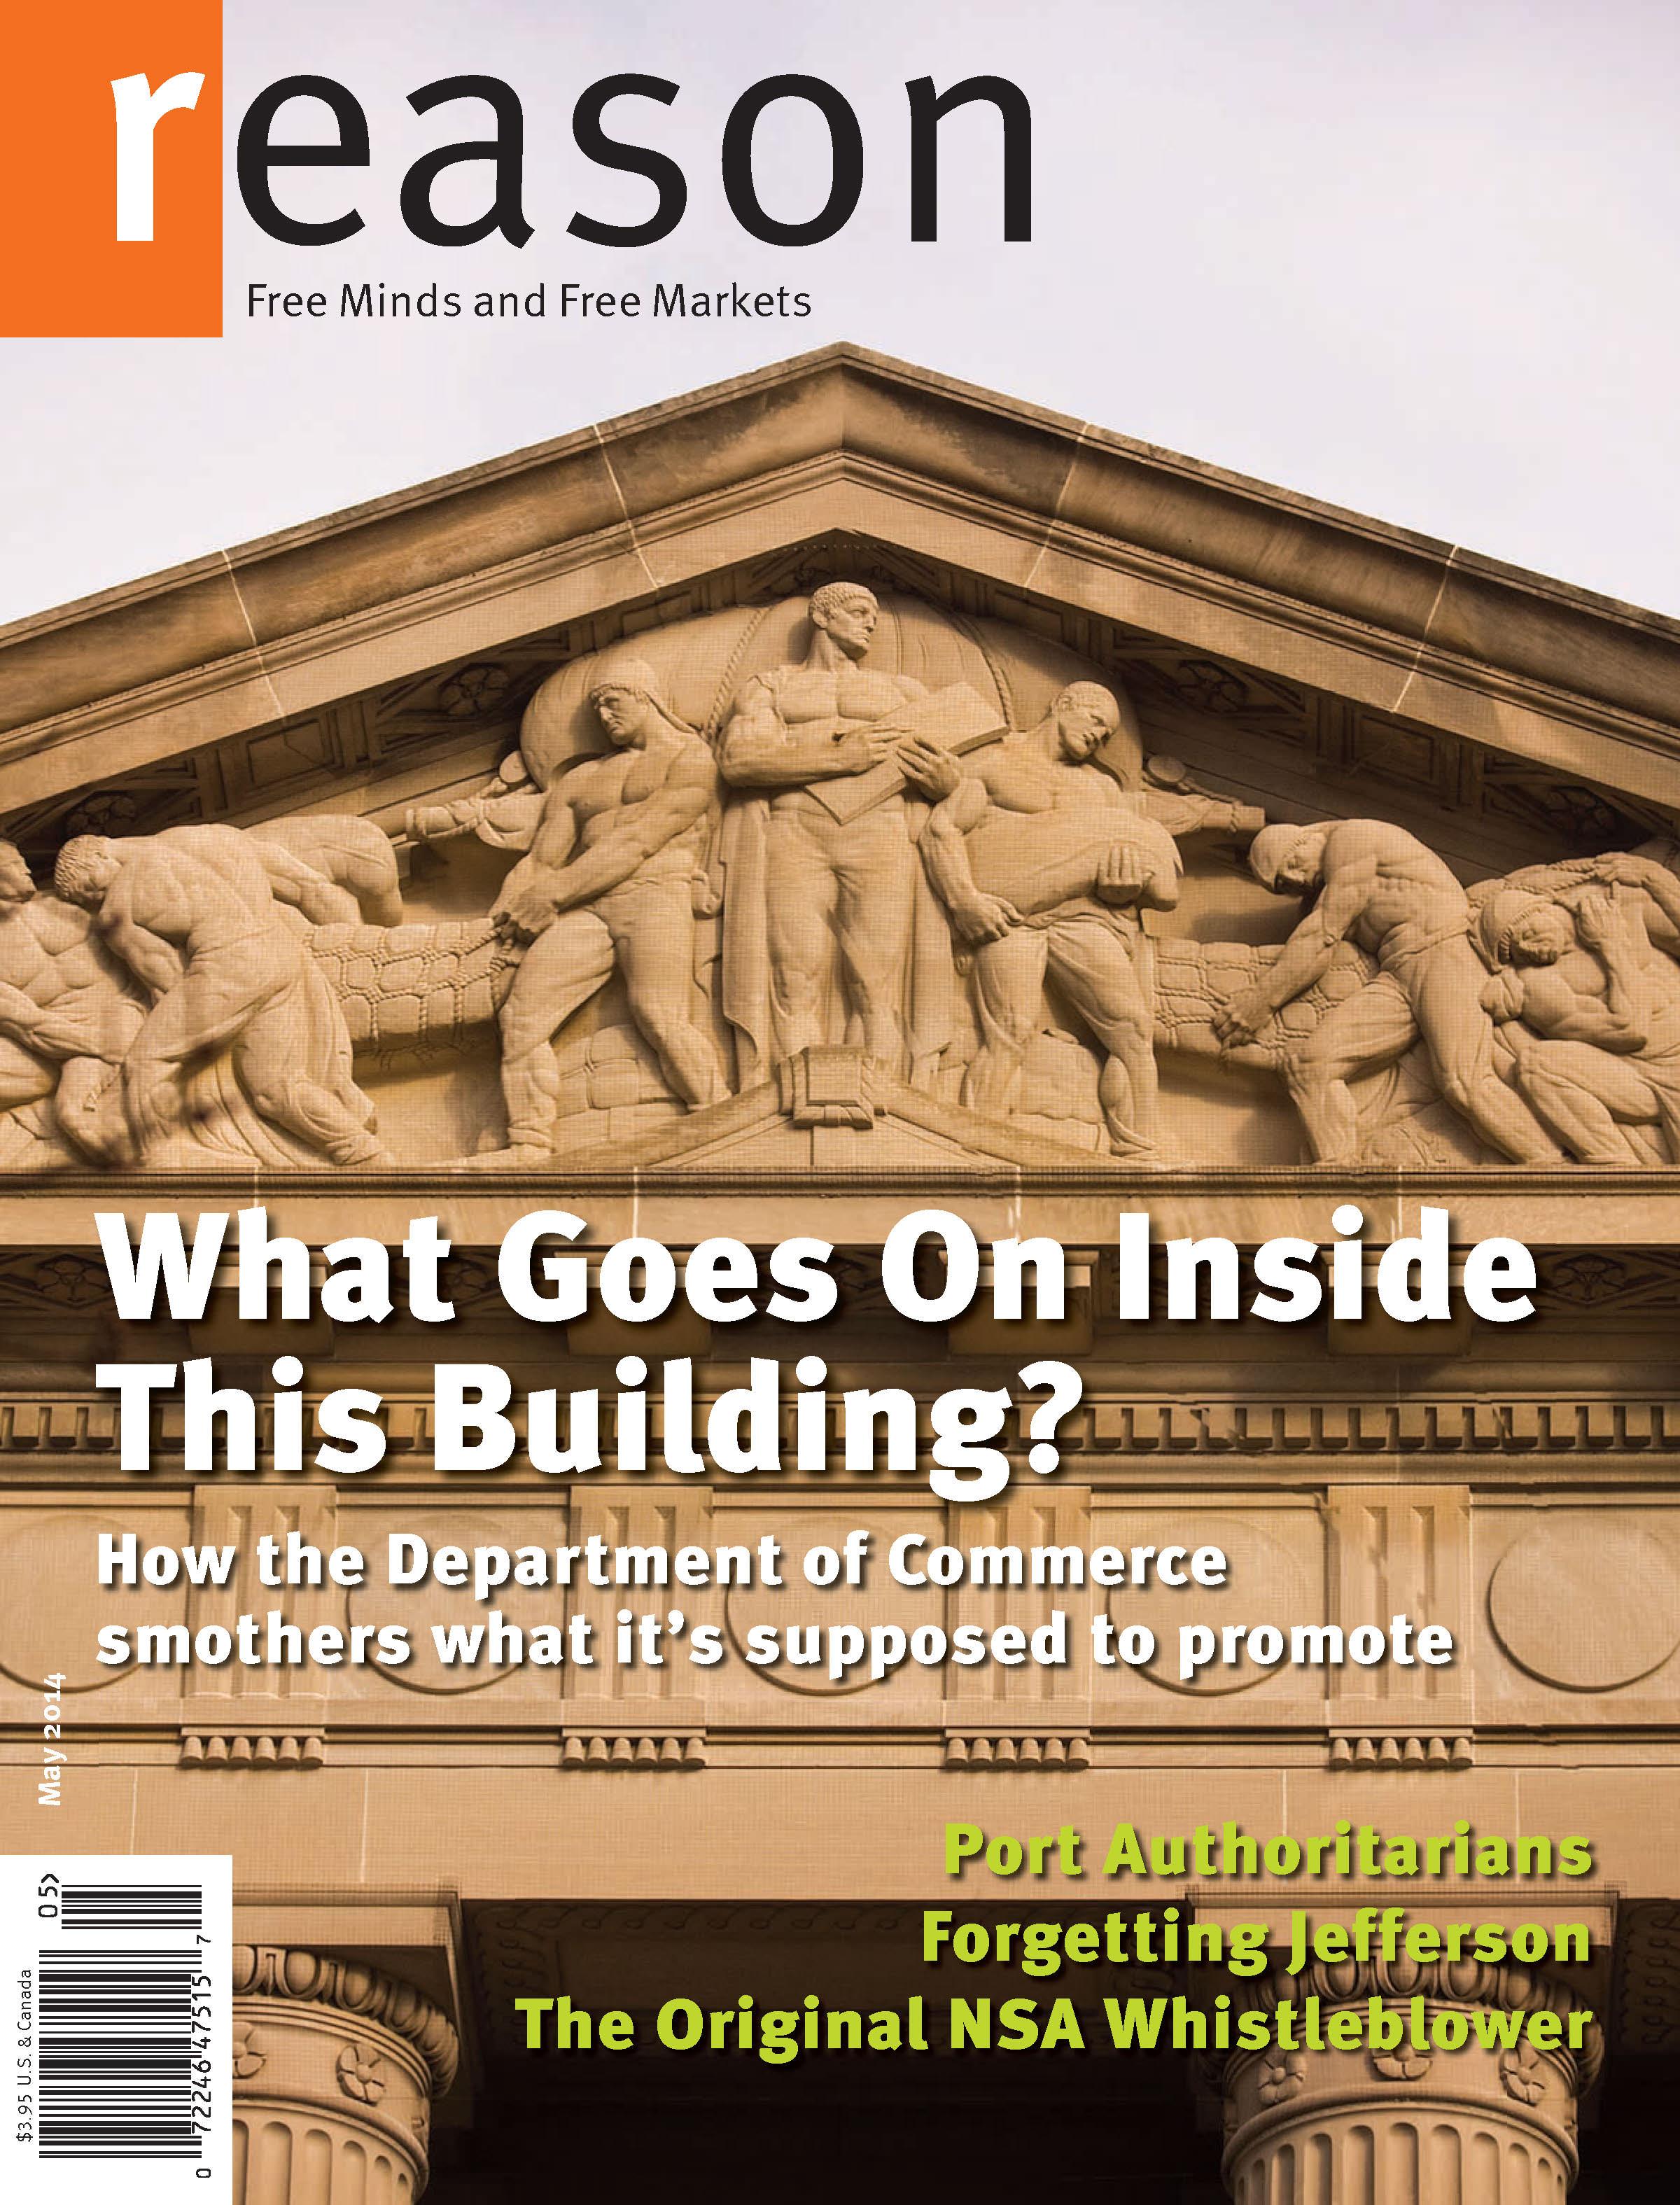 Reason Magazine, May 2014 cover image